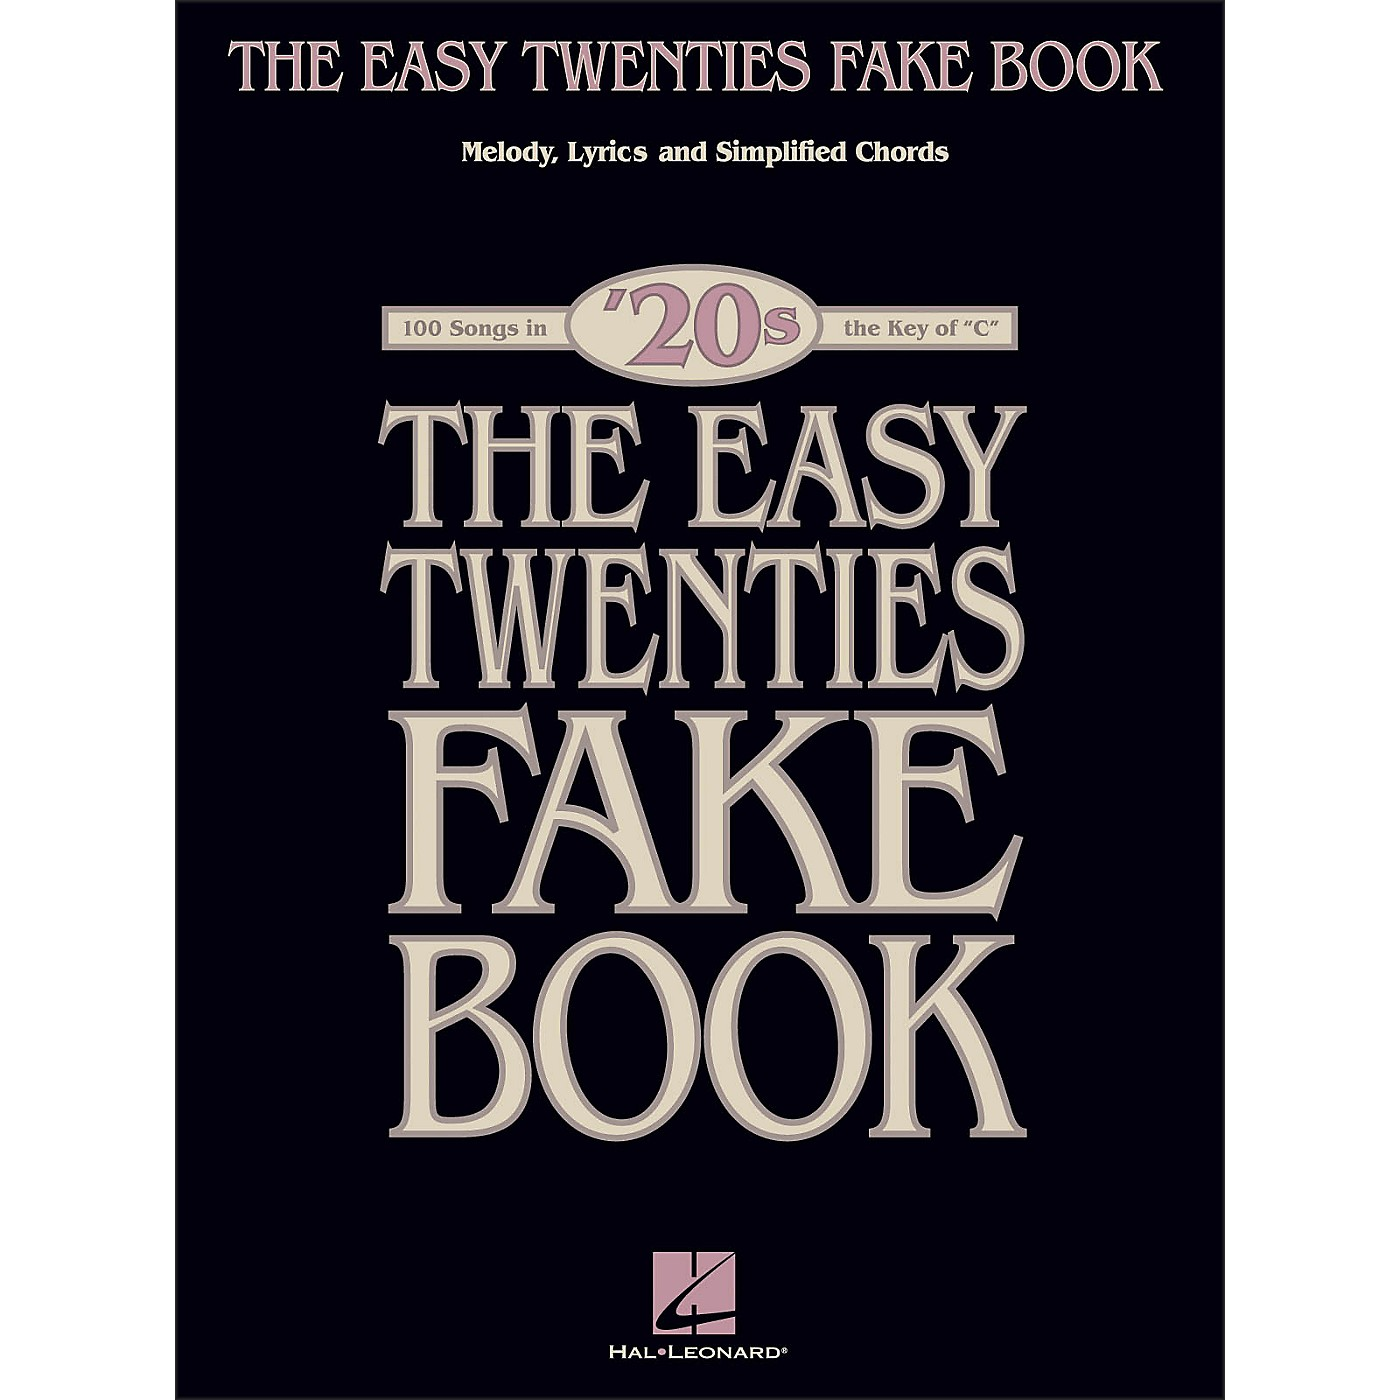 Hal Leonard The Easy Twenties Fake Book - 100 Songs In The Key Of C thumbnail